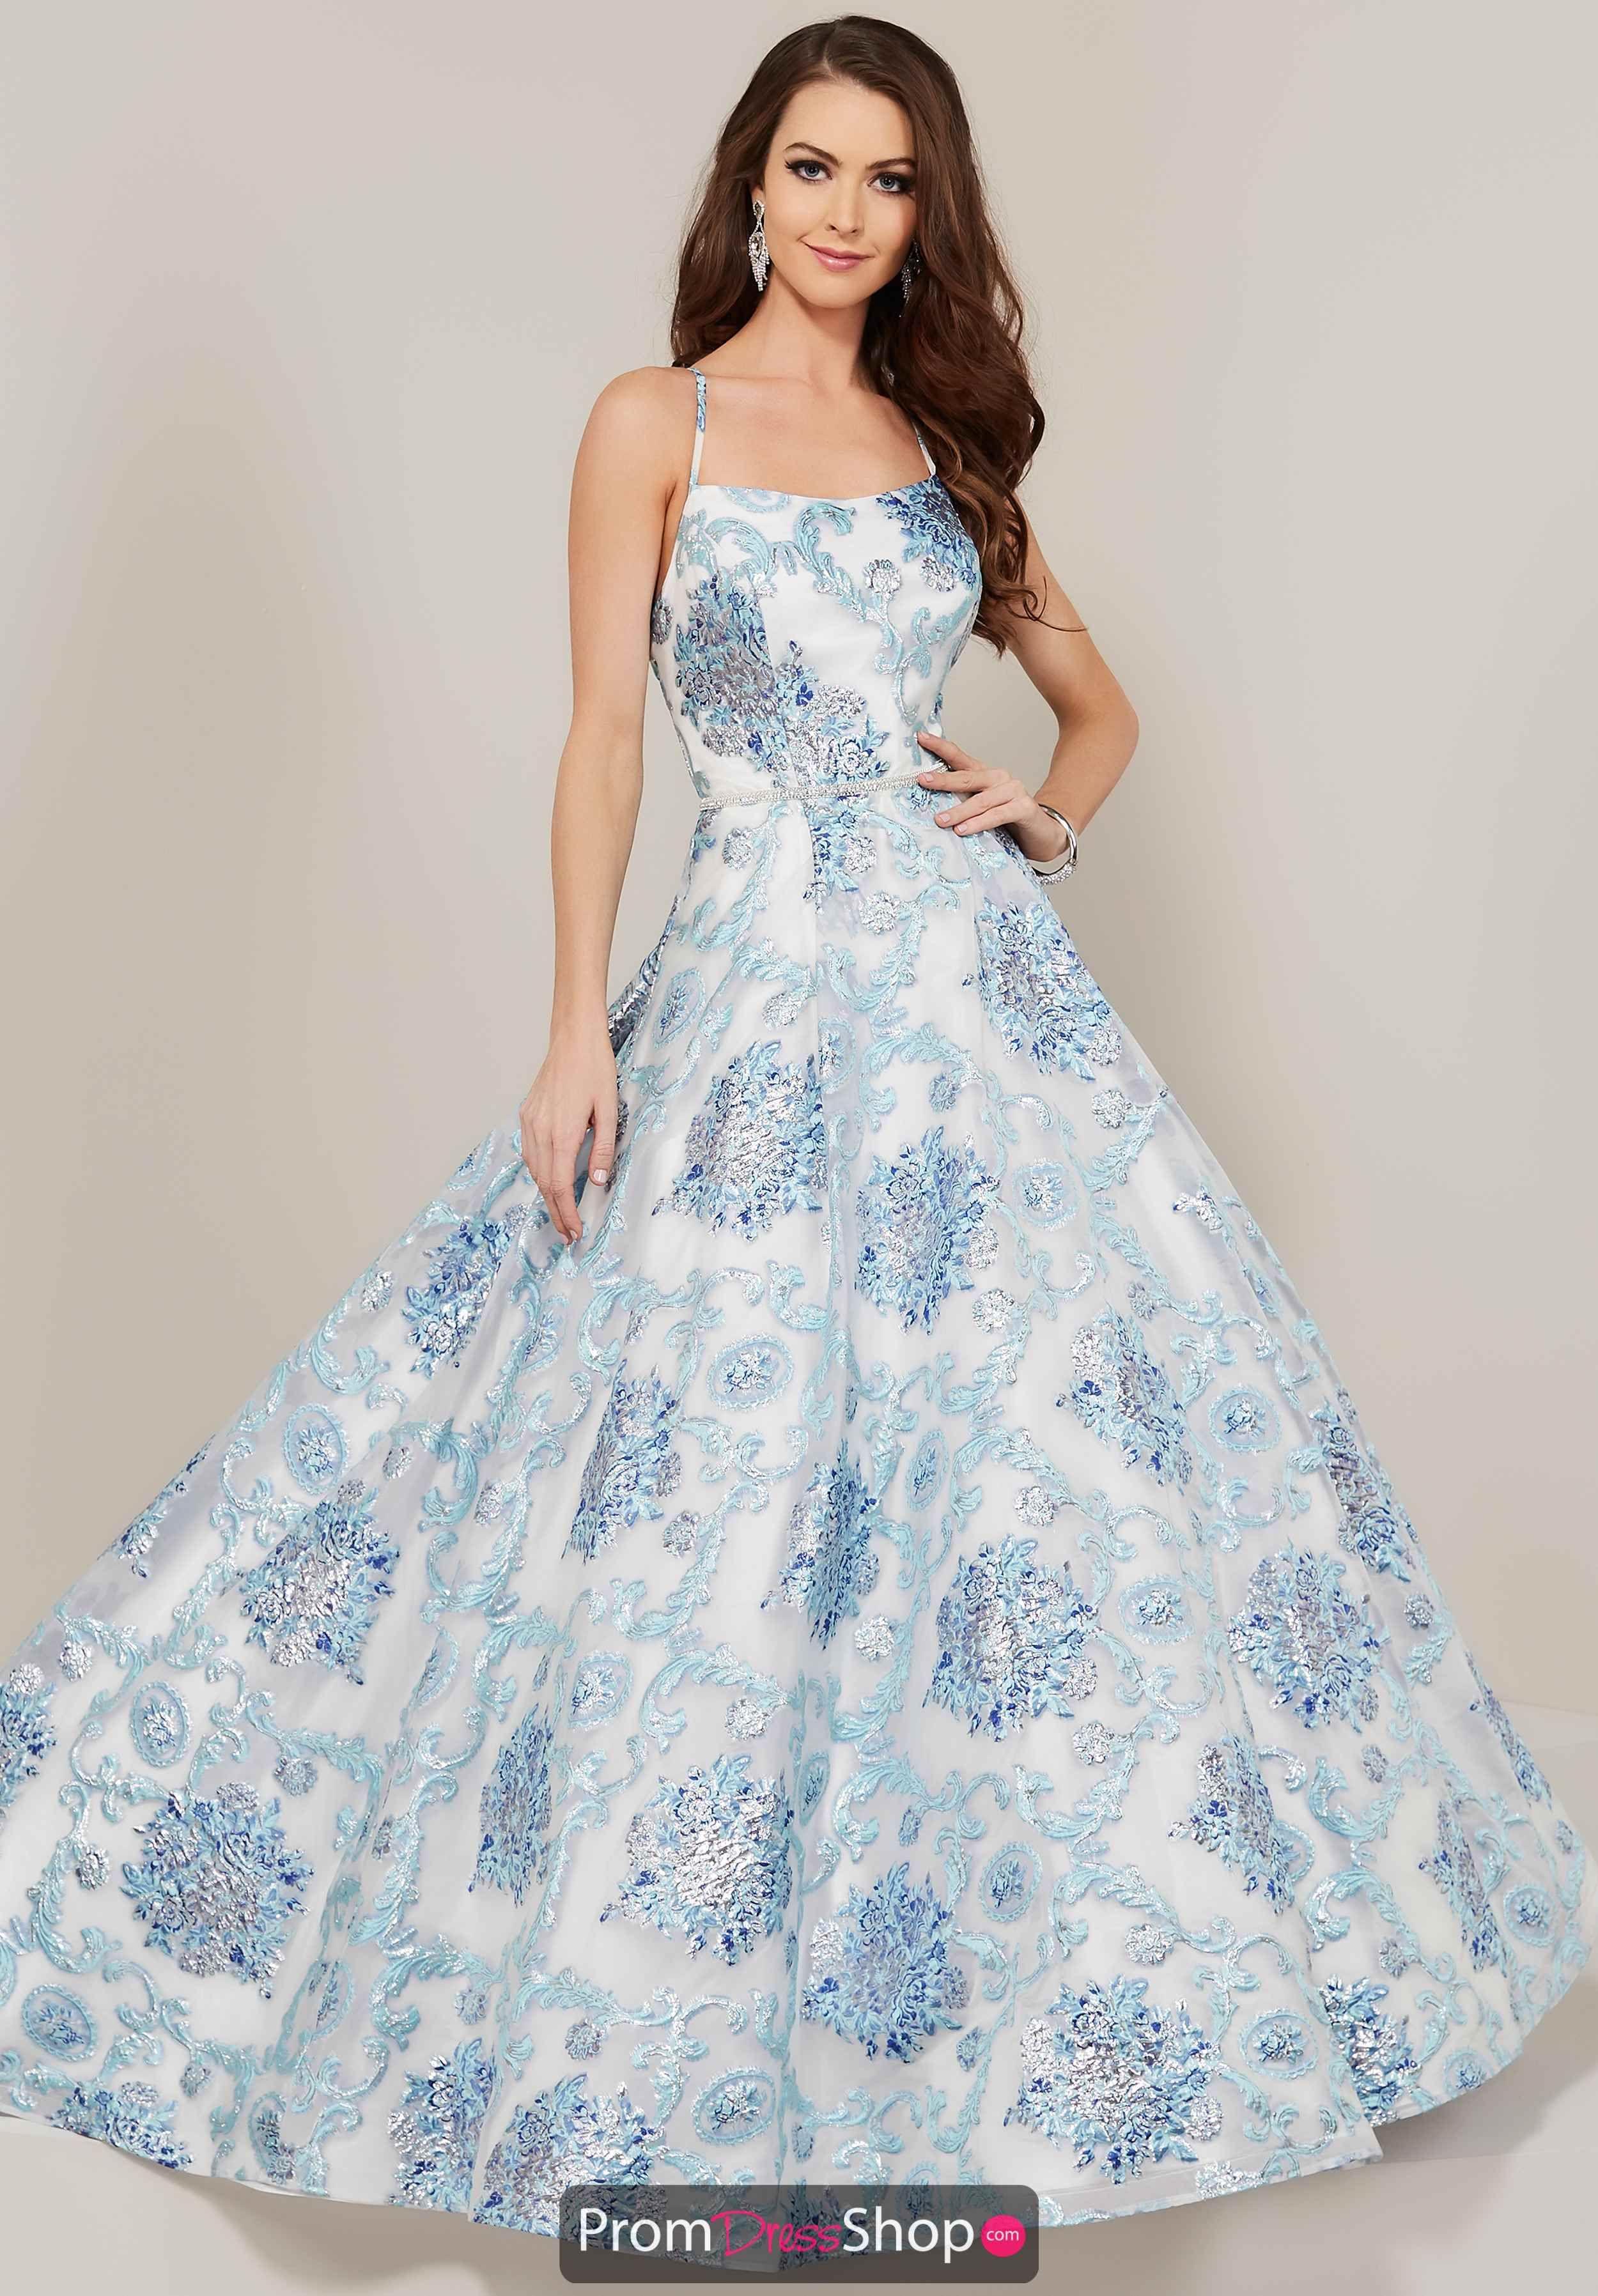 dfc2fdef781 China Blue Tiffany Dresses, High Fashion Trends, Brocade Dresses,  Rhinestone Belt, Dress